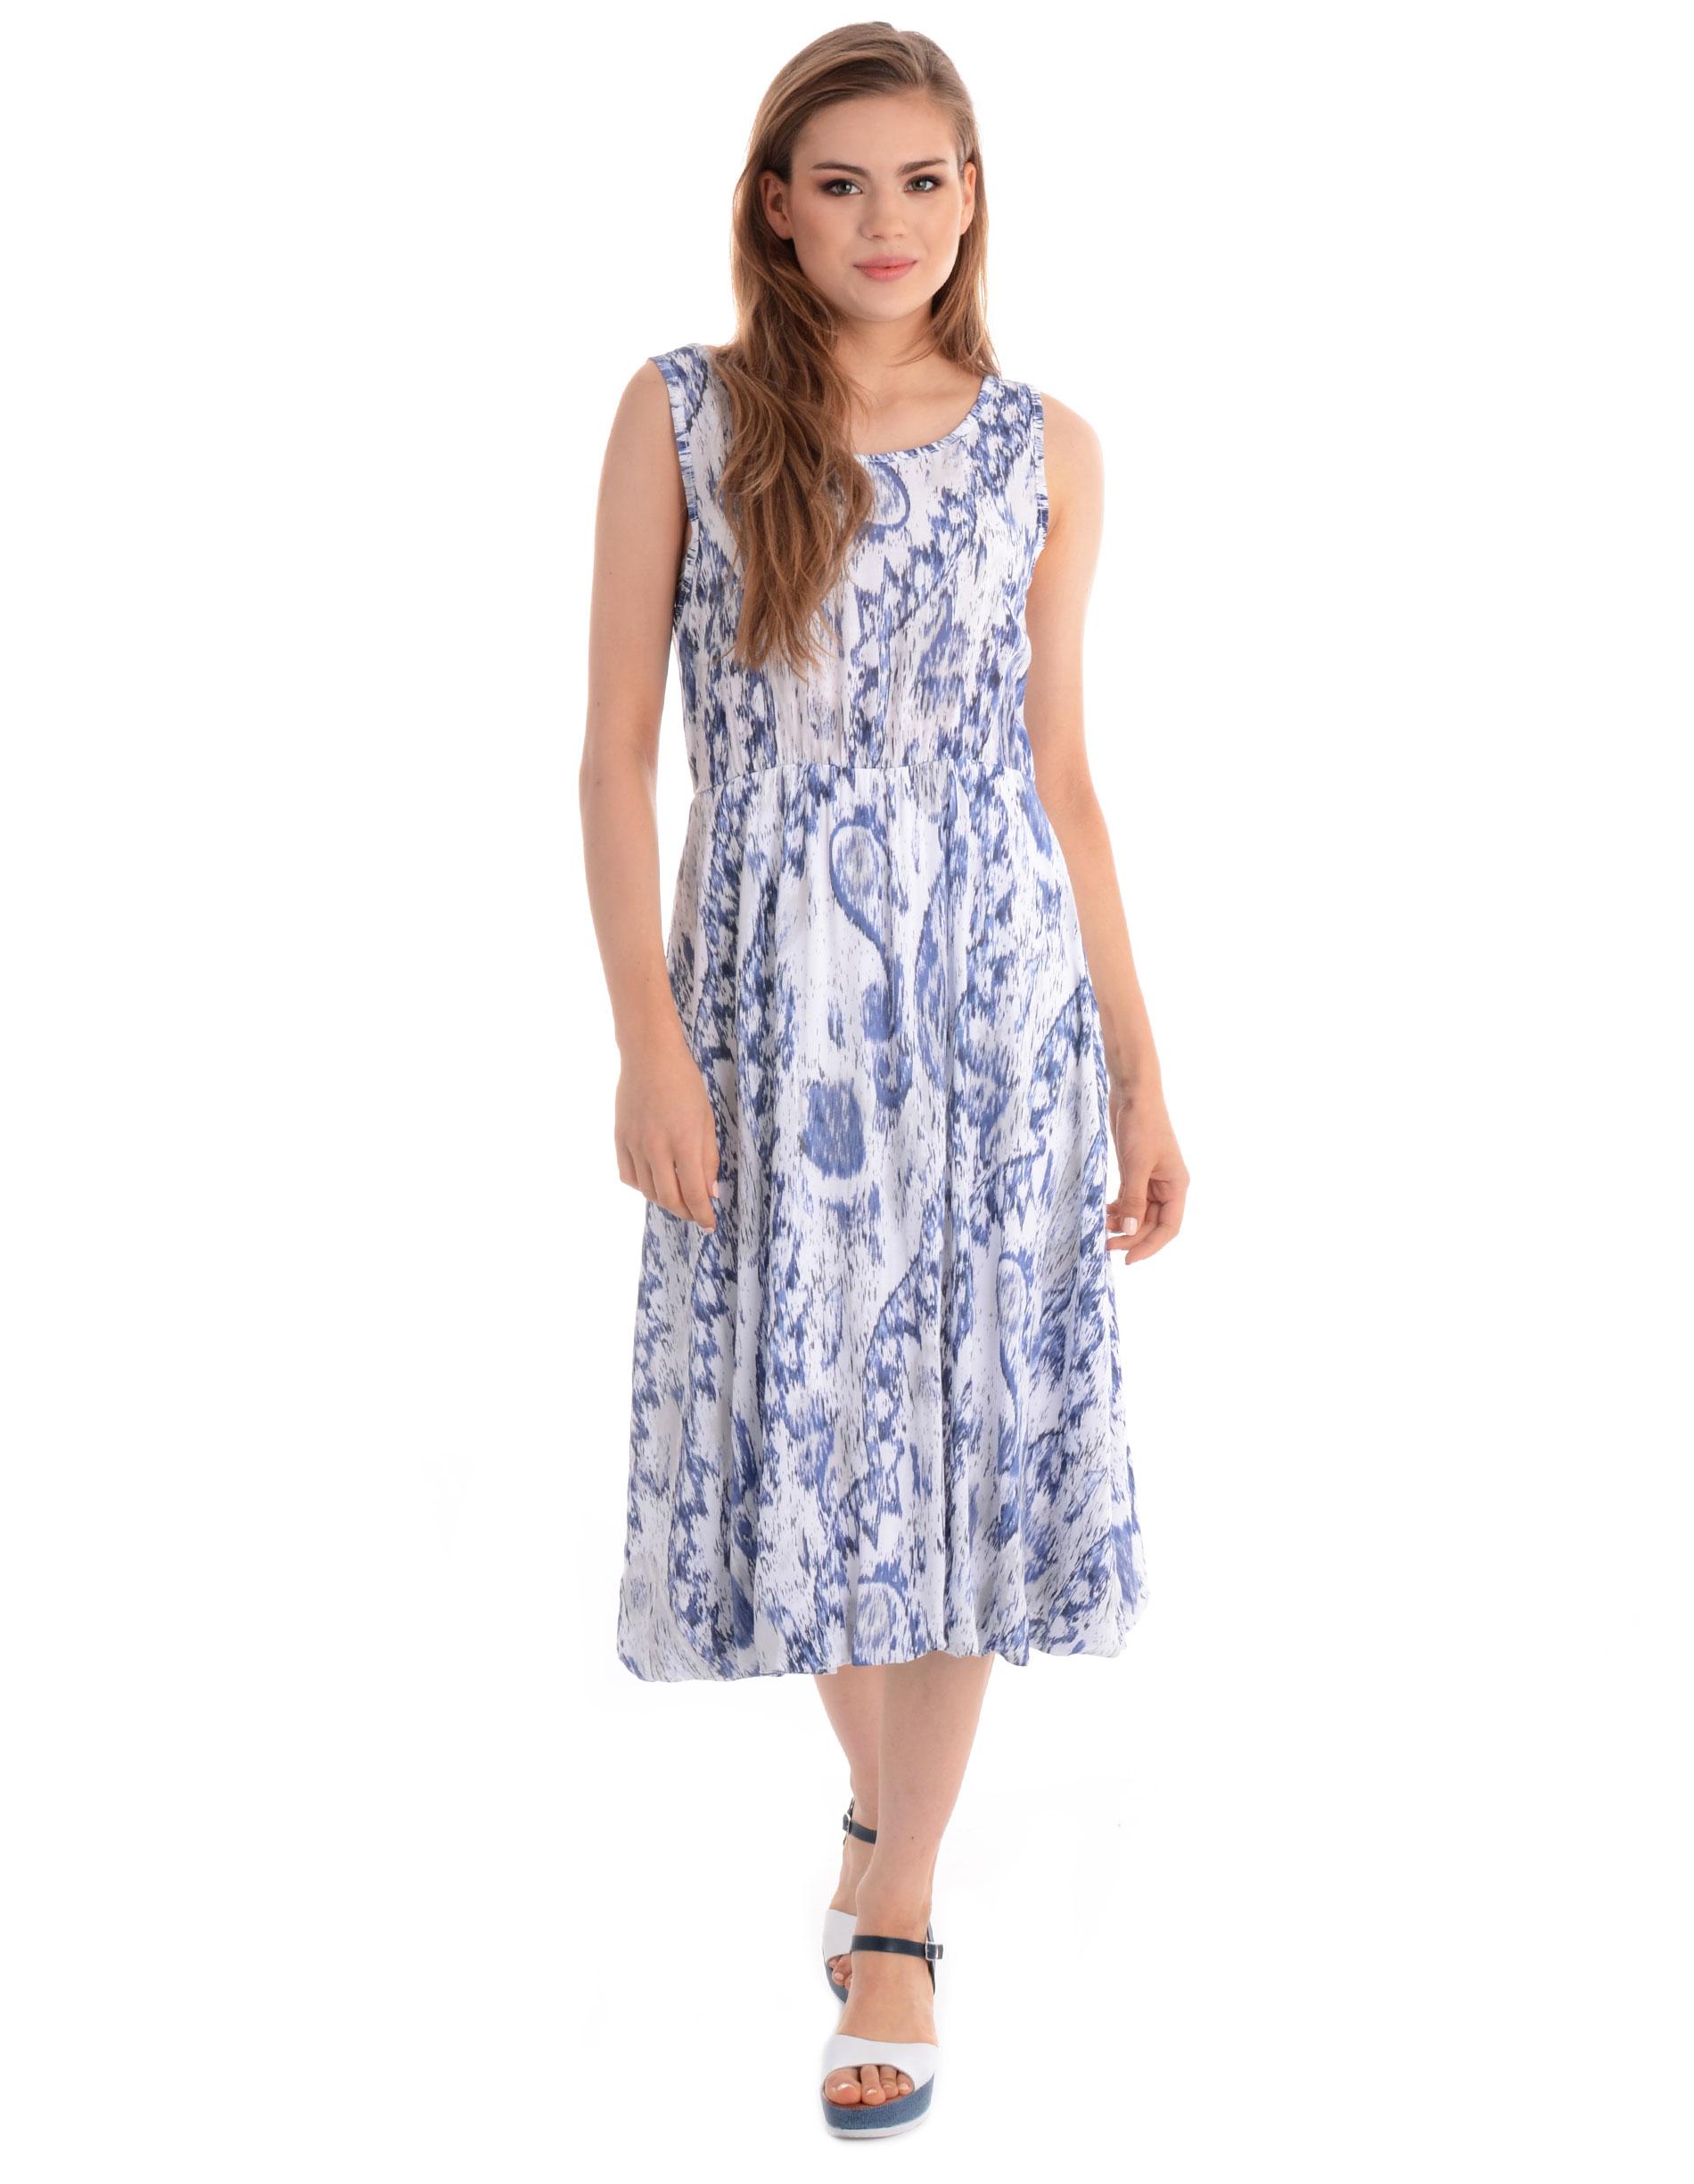 Sukienka - 115-2851 BIAN - Unisono